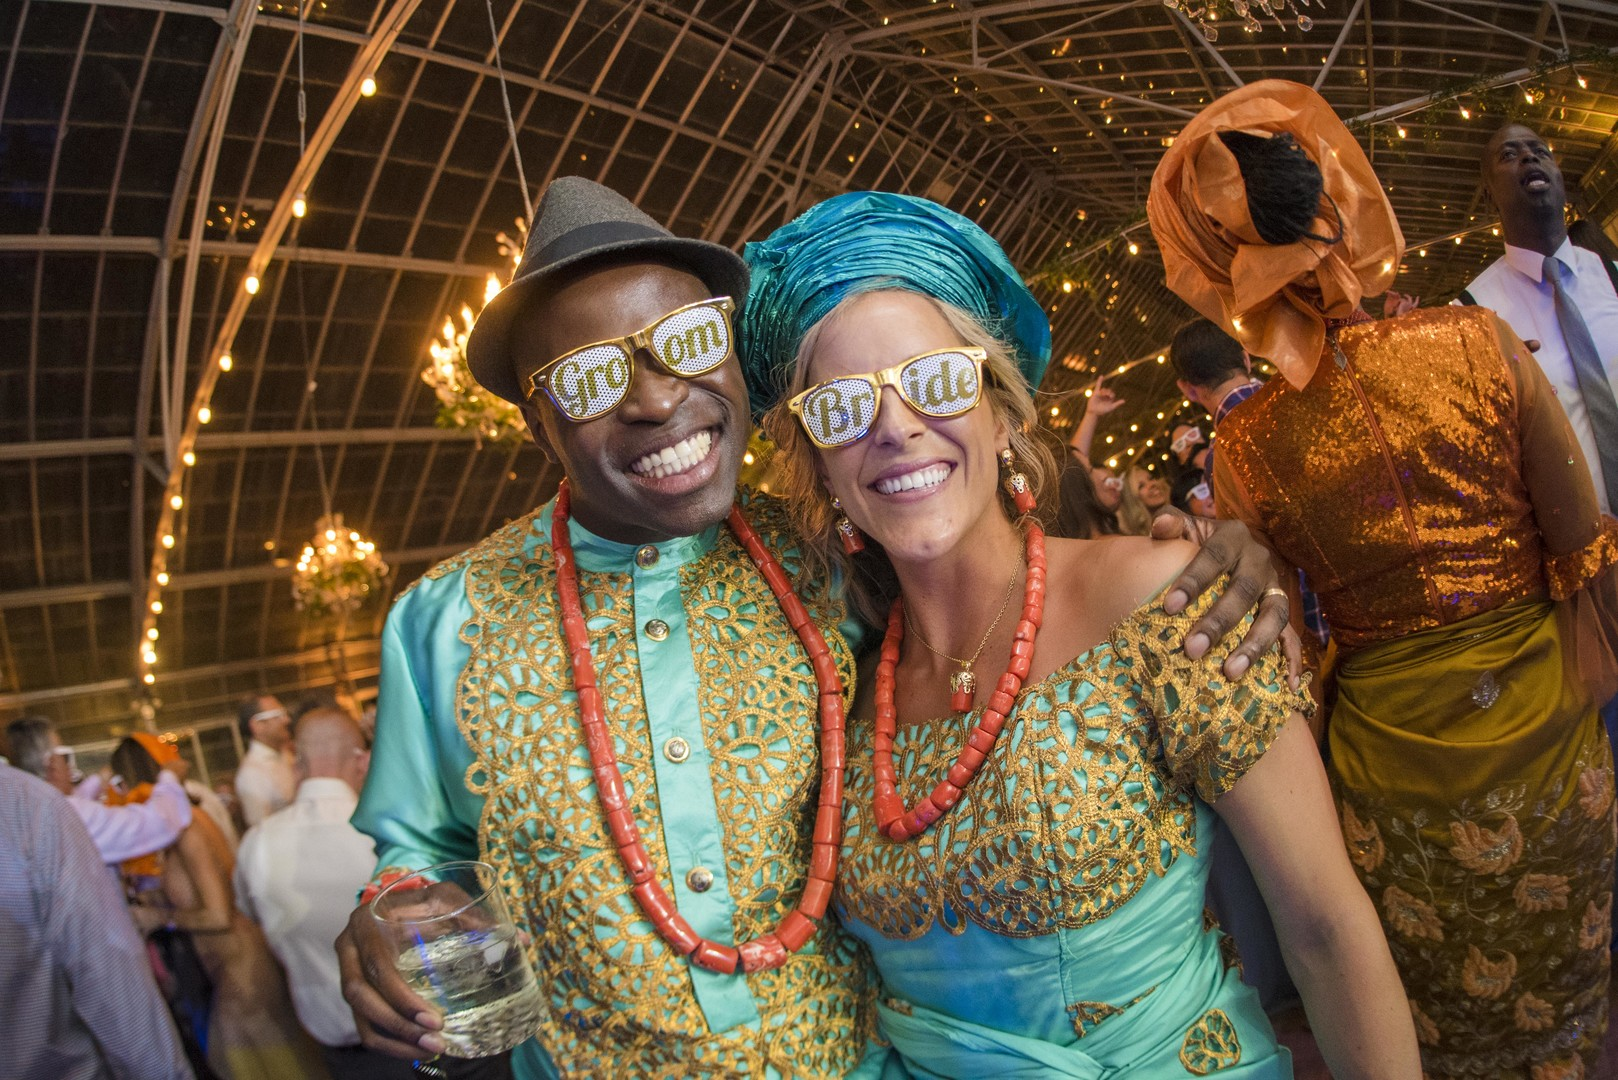 www.santabarbarawedding.com | Venue: Dos Pueblos Ranch | Photographer: ByCherry Photography | Event Designer: Elan Event Rentals | Bride and Groom in Custom Glasses